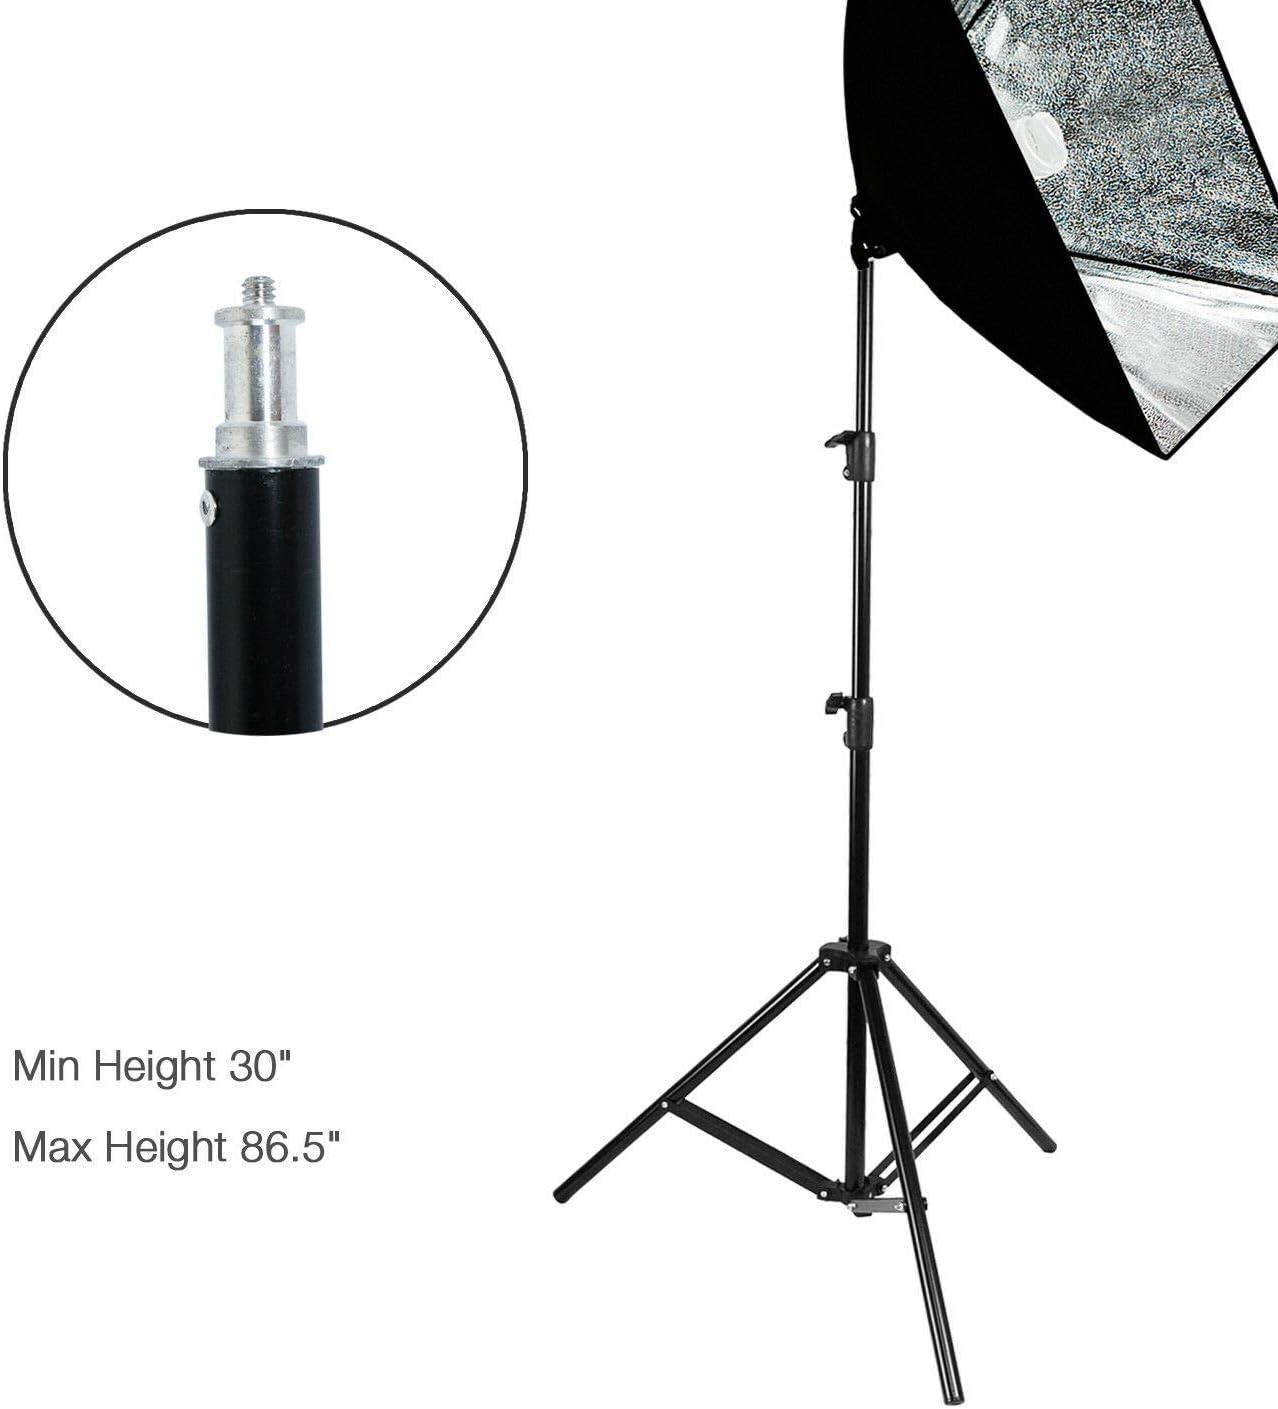 oldzon xz-12 Studio Light Photo Lighting Kit w//Stands Carry Bag Soft Box Boom Stand with Ebook